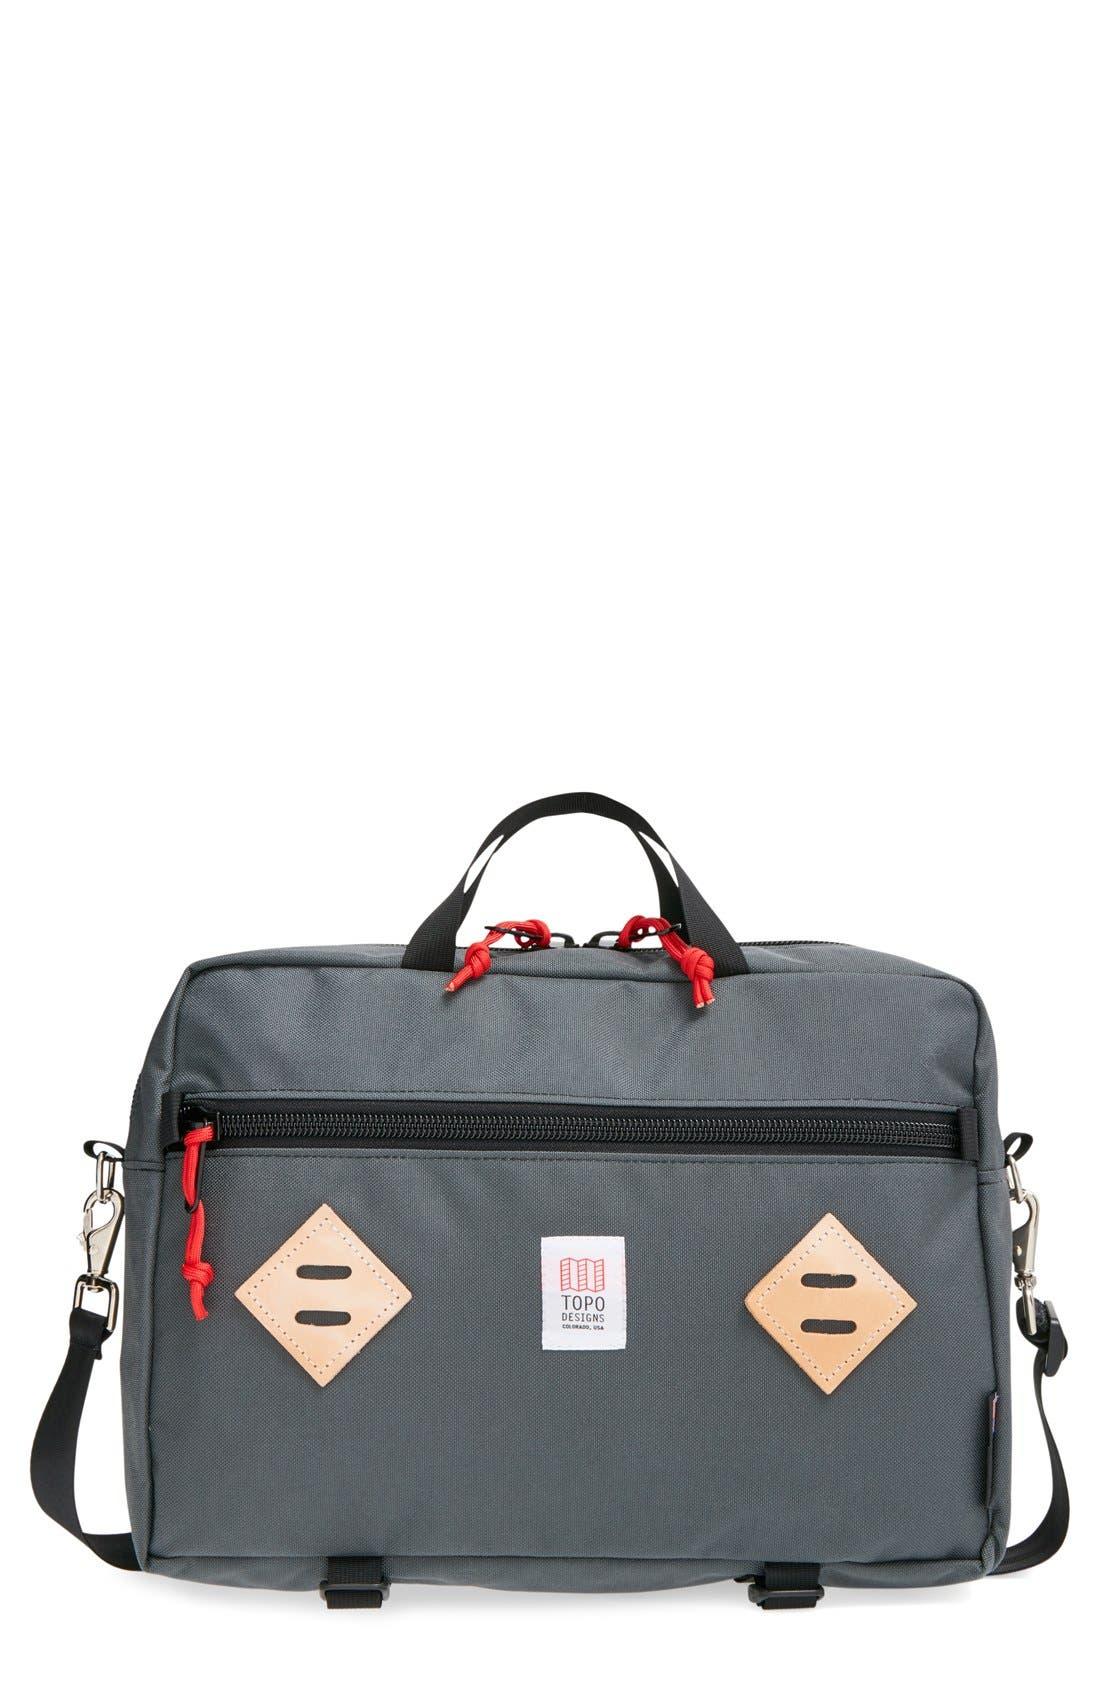 Alternate Image 1 Selected - Topo Designs 'Mountain' Briefcase